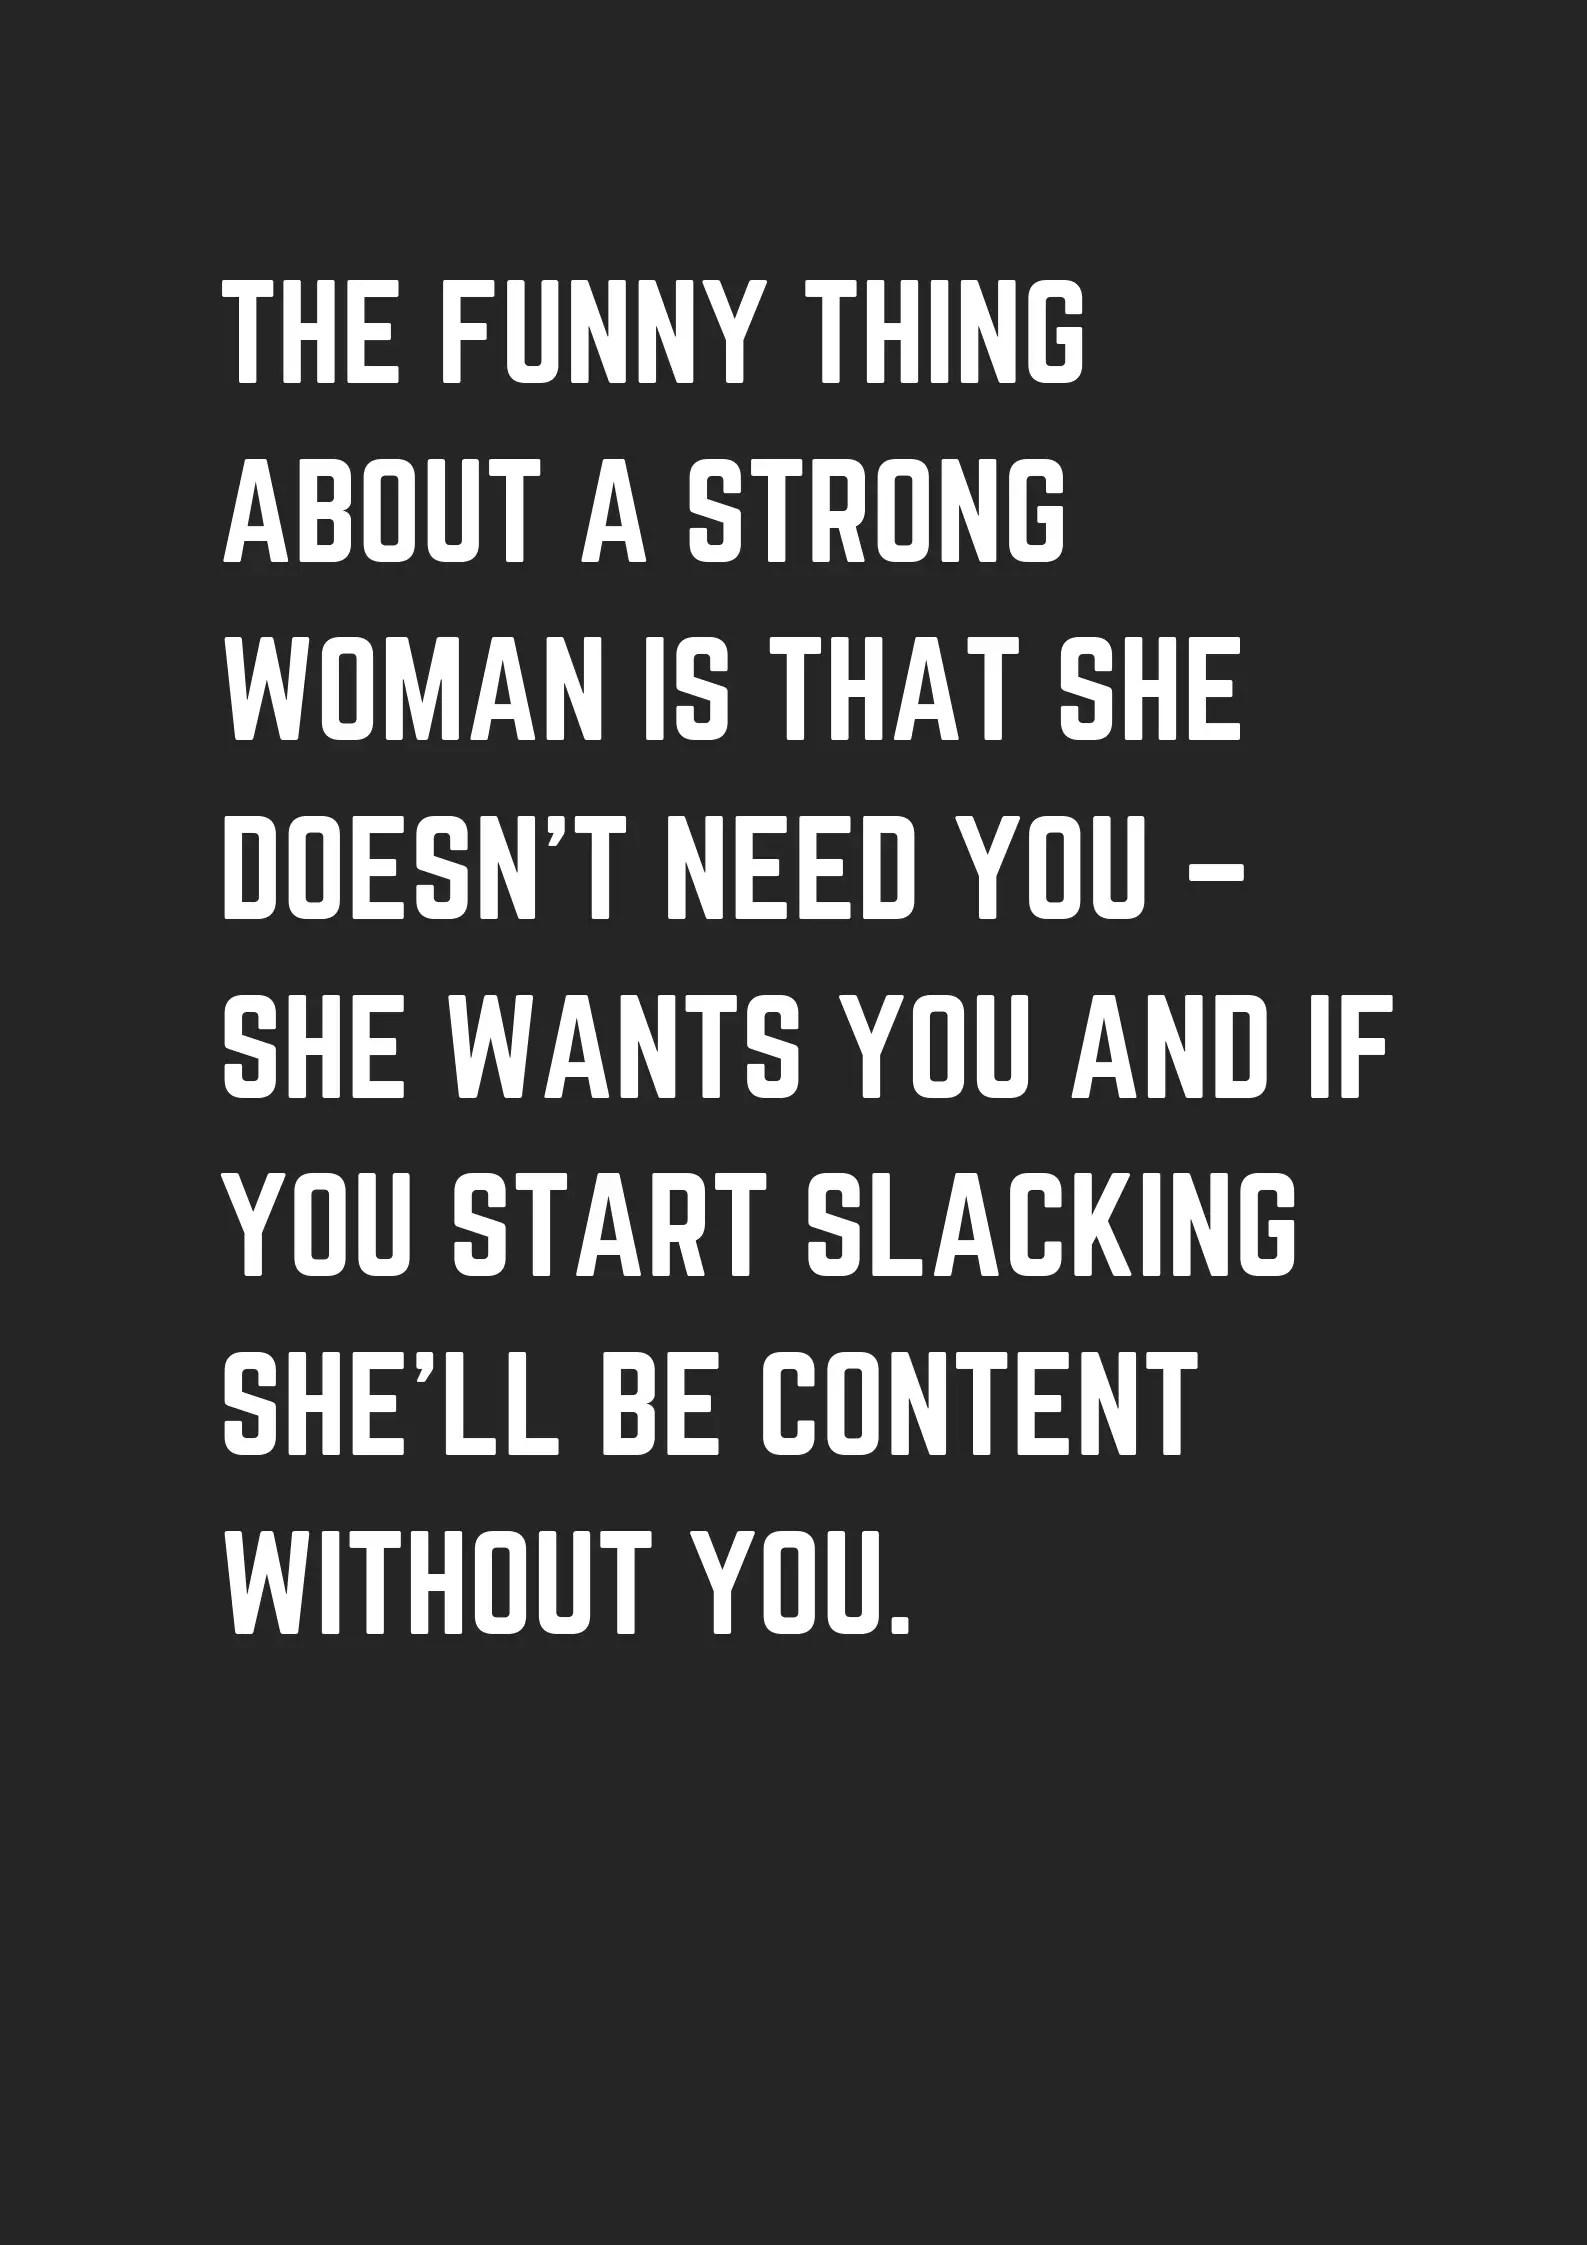 Funny Strong Women Quotes : funny, strong, women, quotes, Funny, Strong, Woman, Quotes, Daily